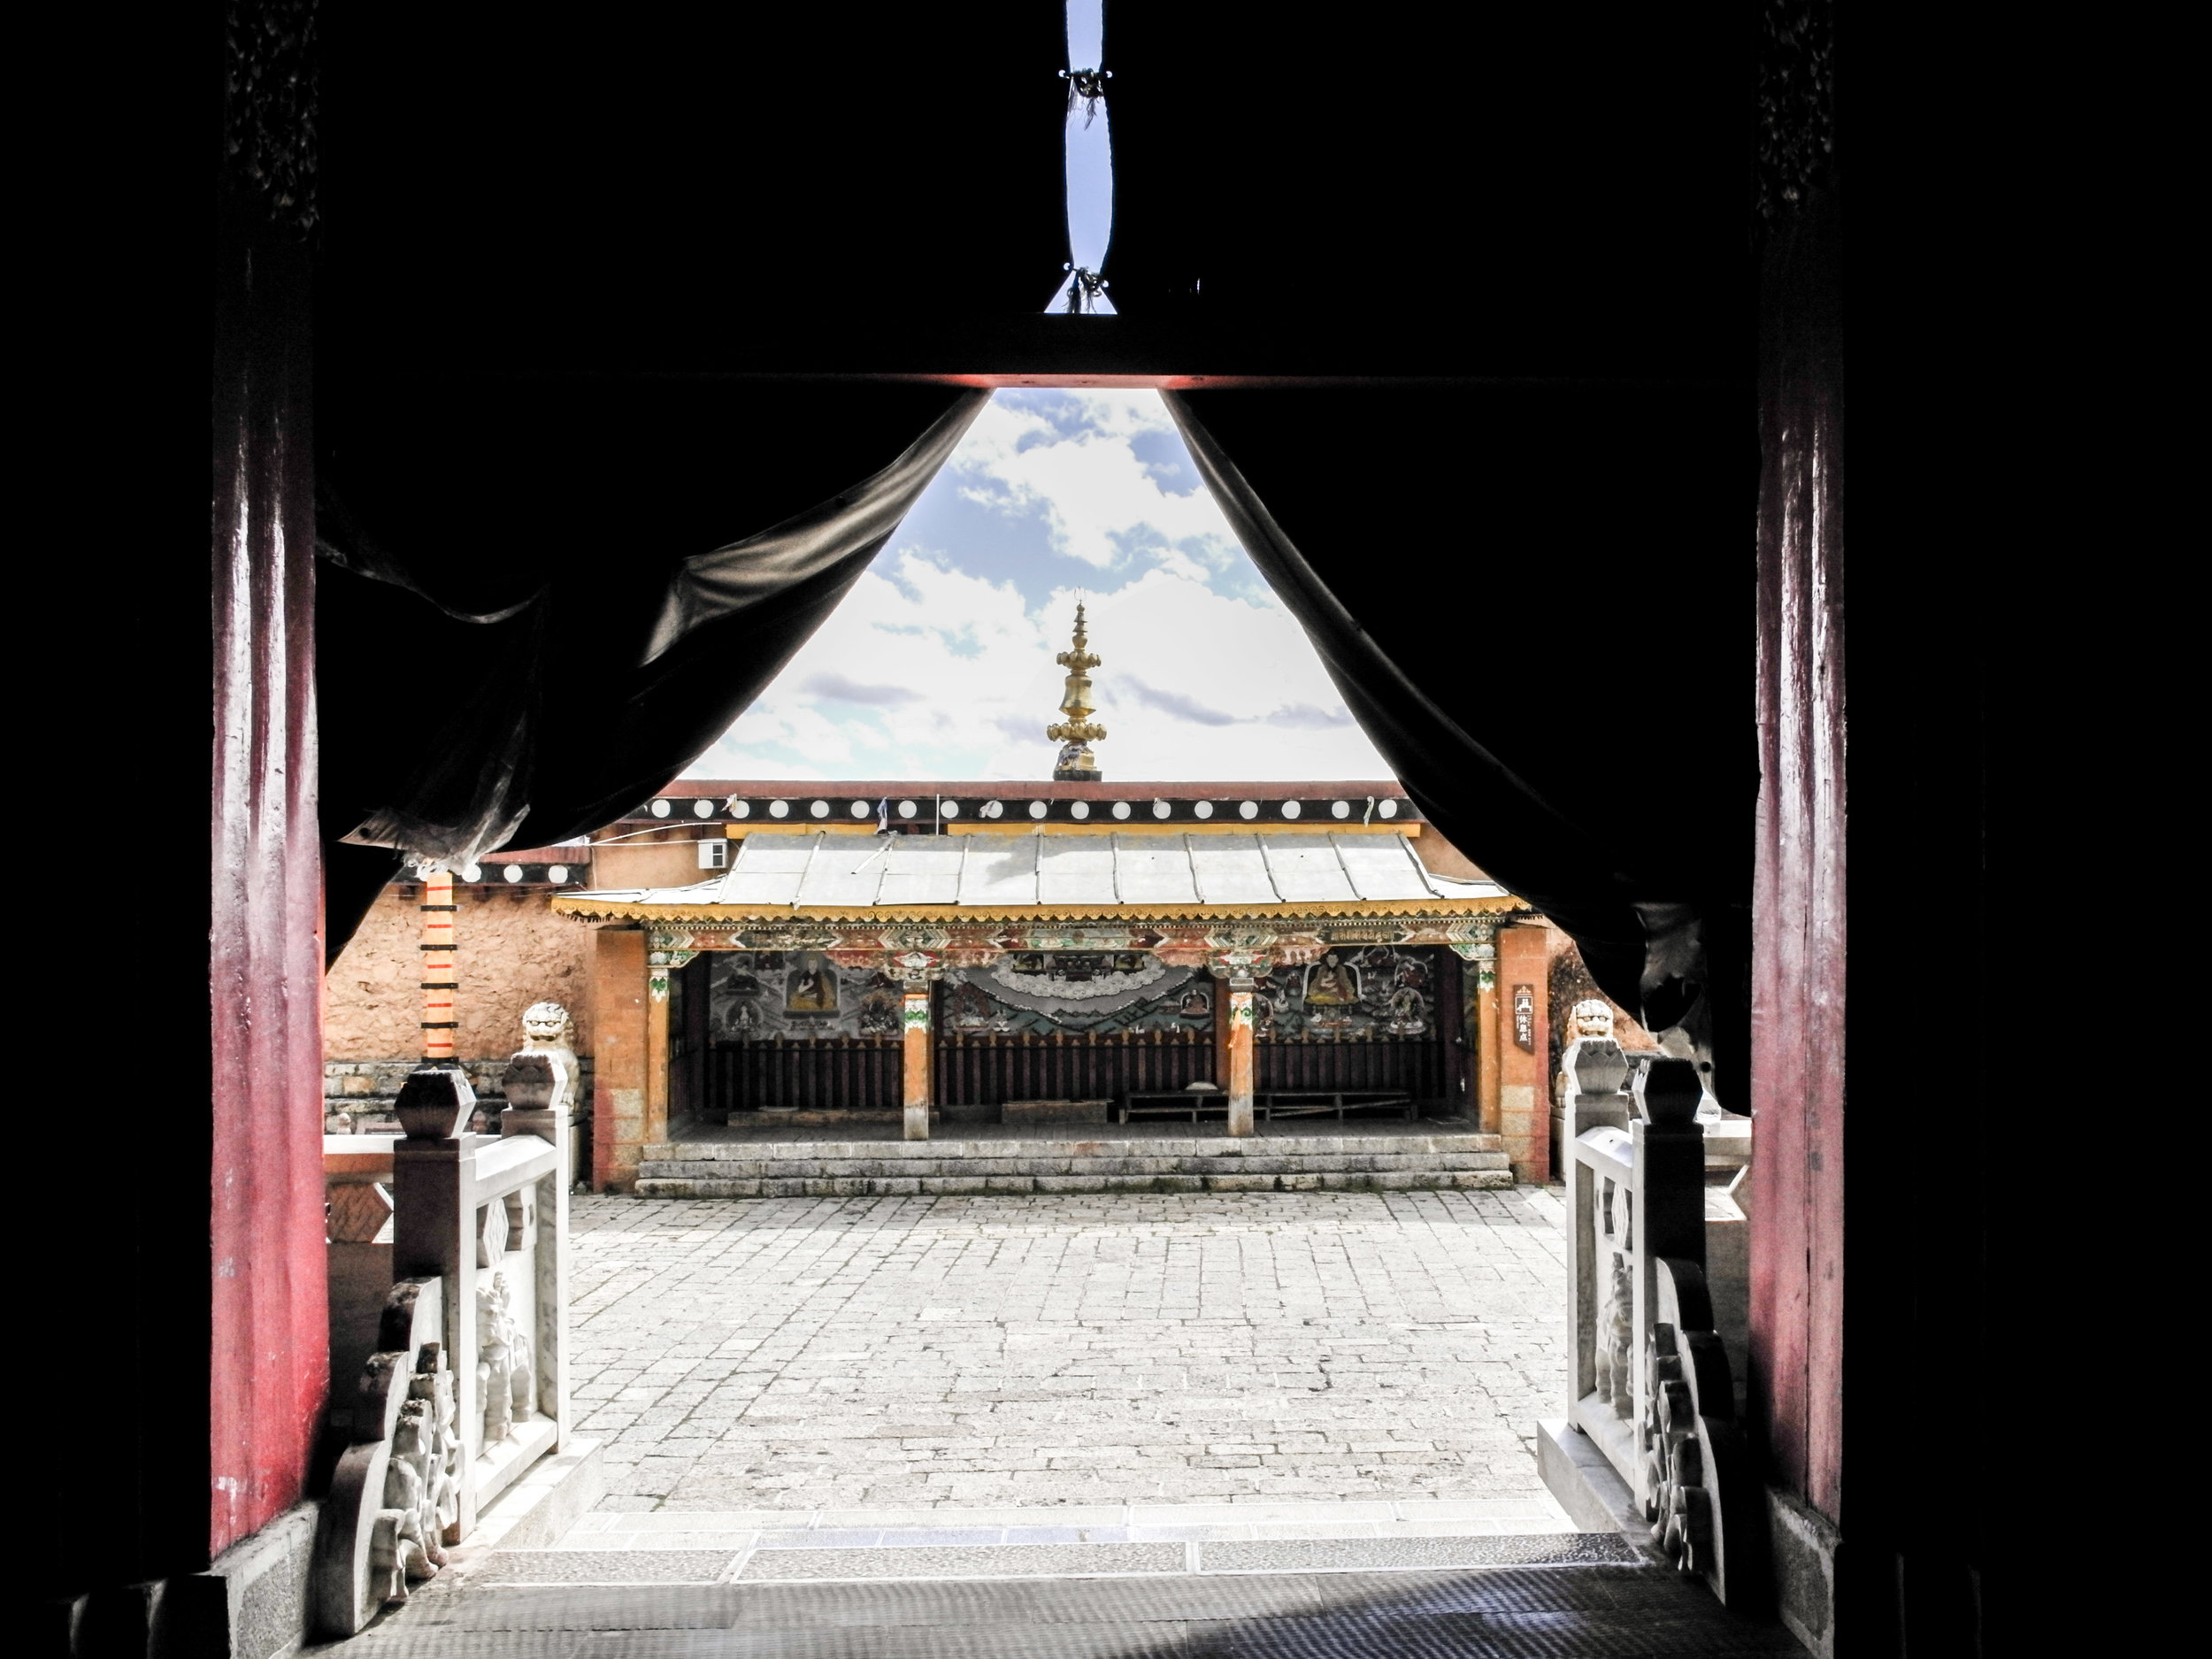 10. Dêqên aka Shangri La, The Mystical Paradise -